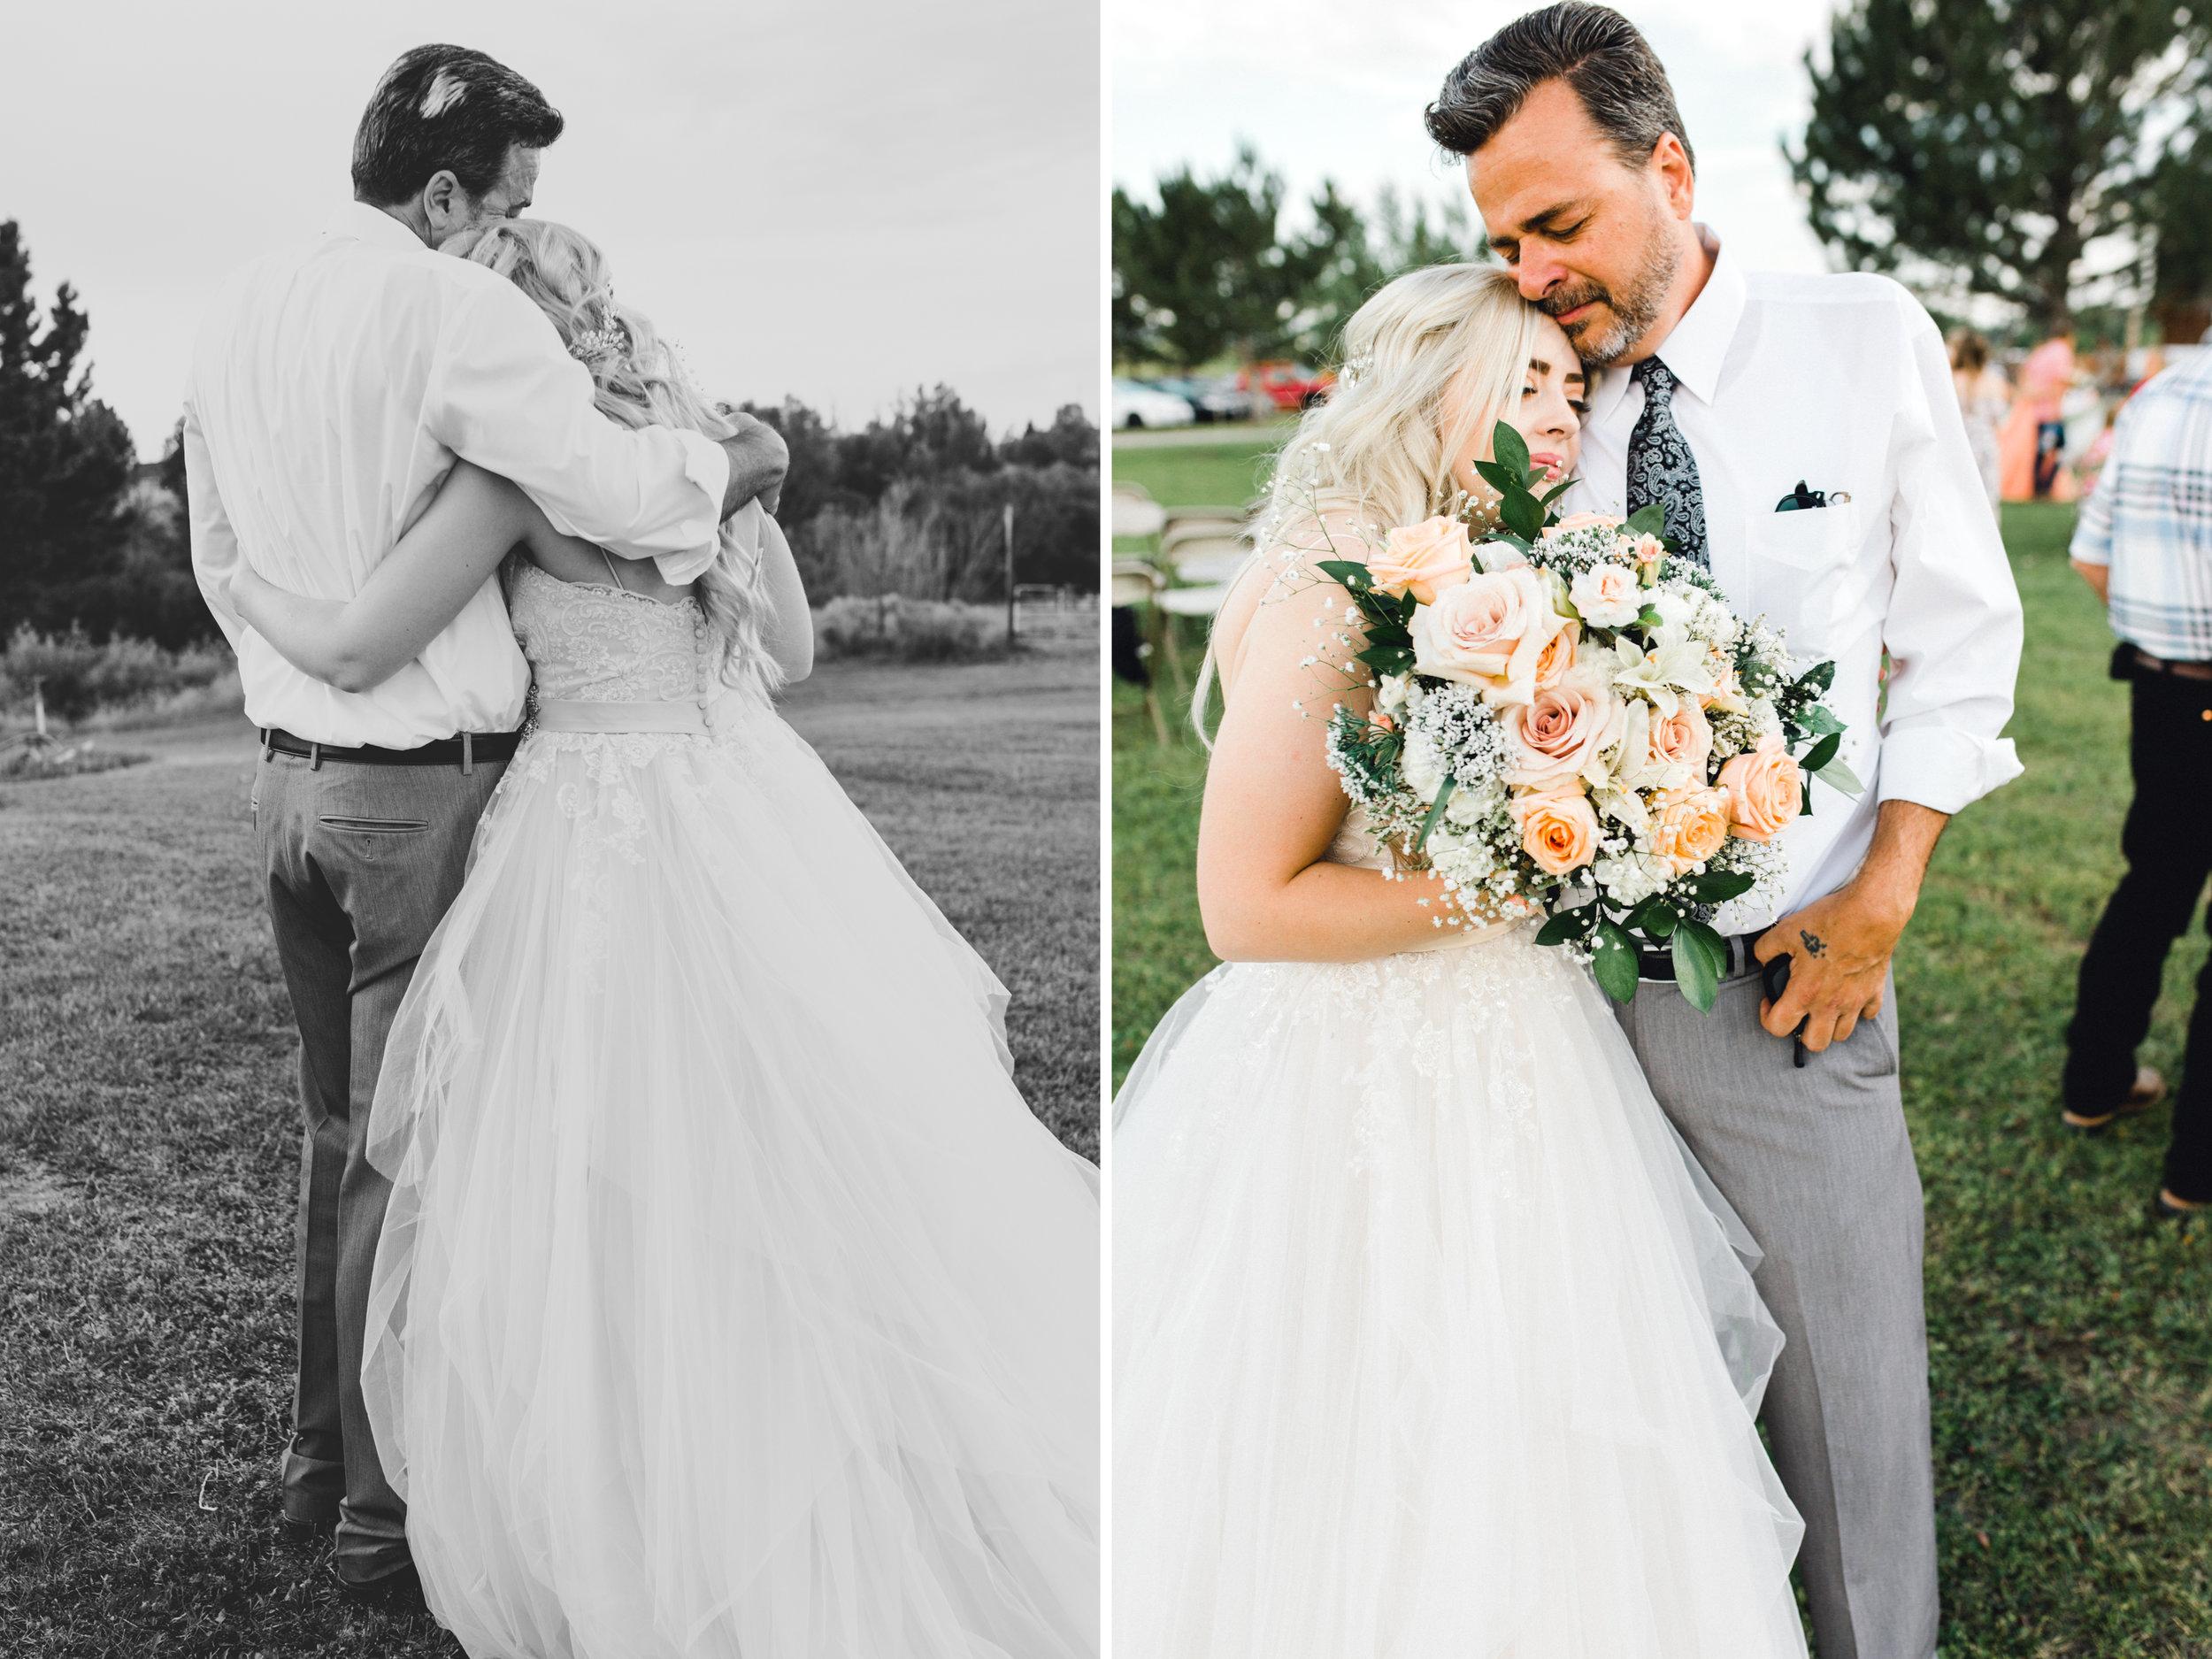 country-outdoor-rustic-wedding-tetons-idaho-anna-christine-photo-23.jpg